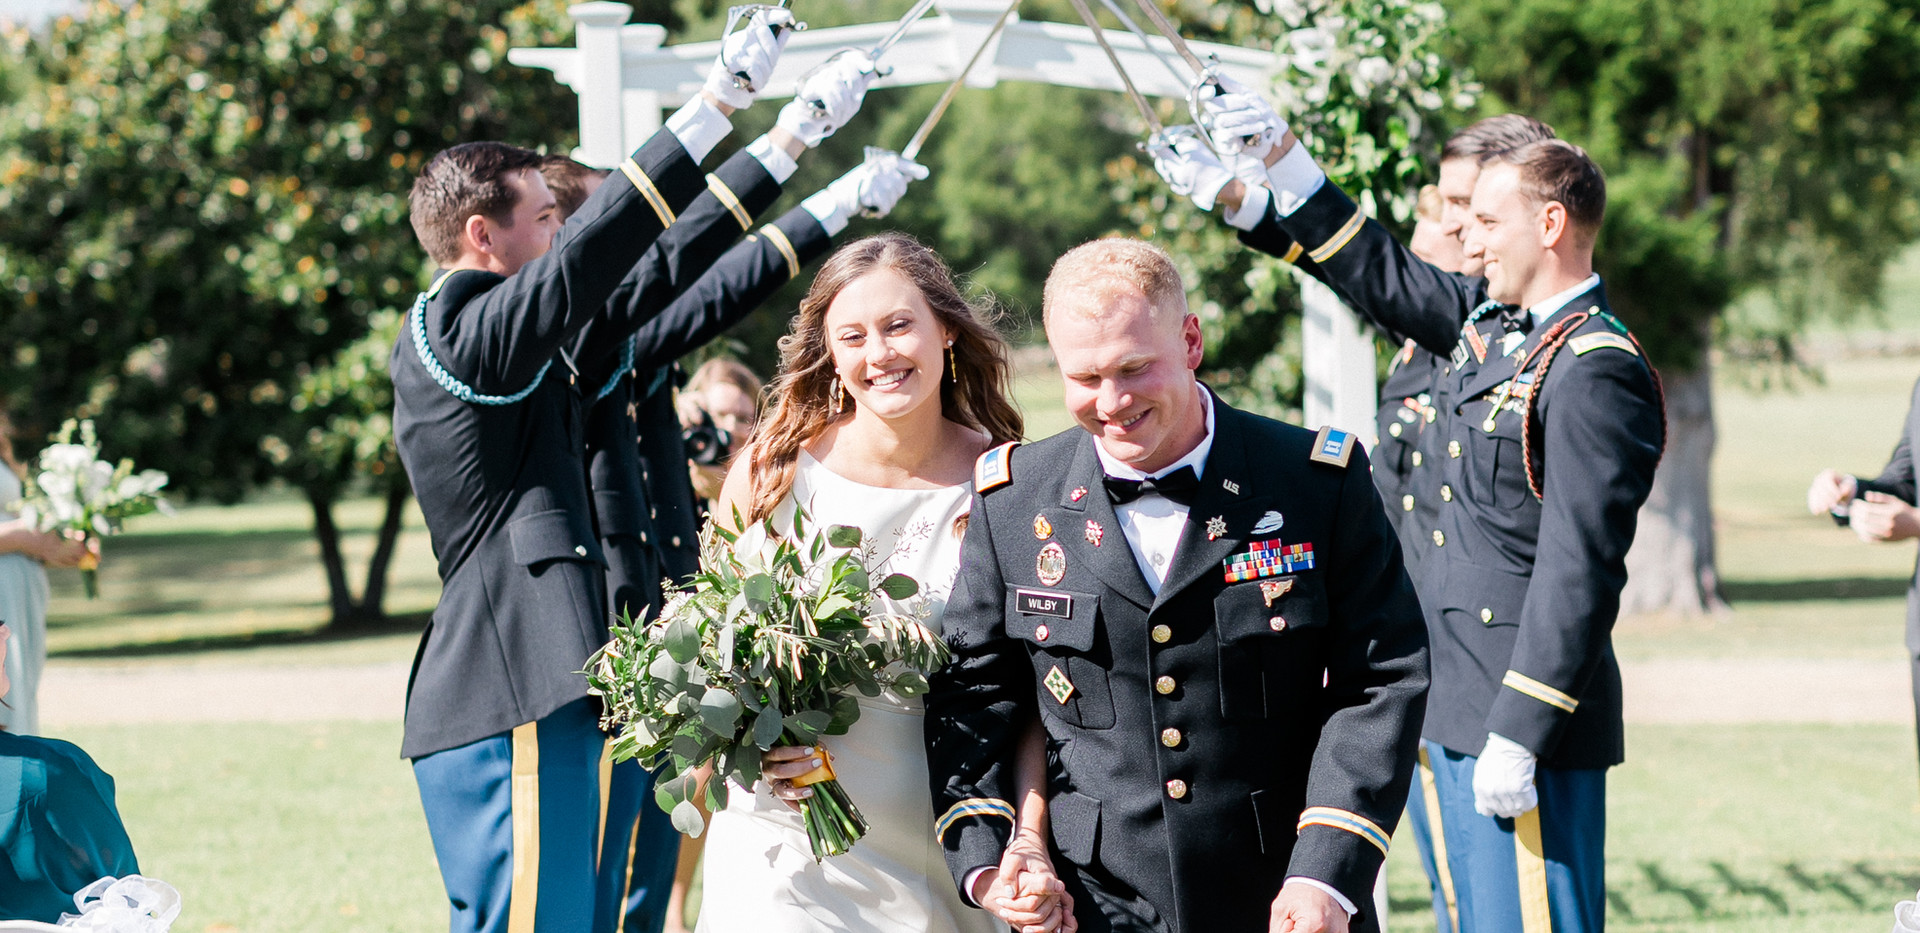 McKenzie and Taylor Wedding 2019-274.jpg